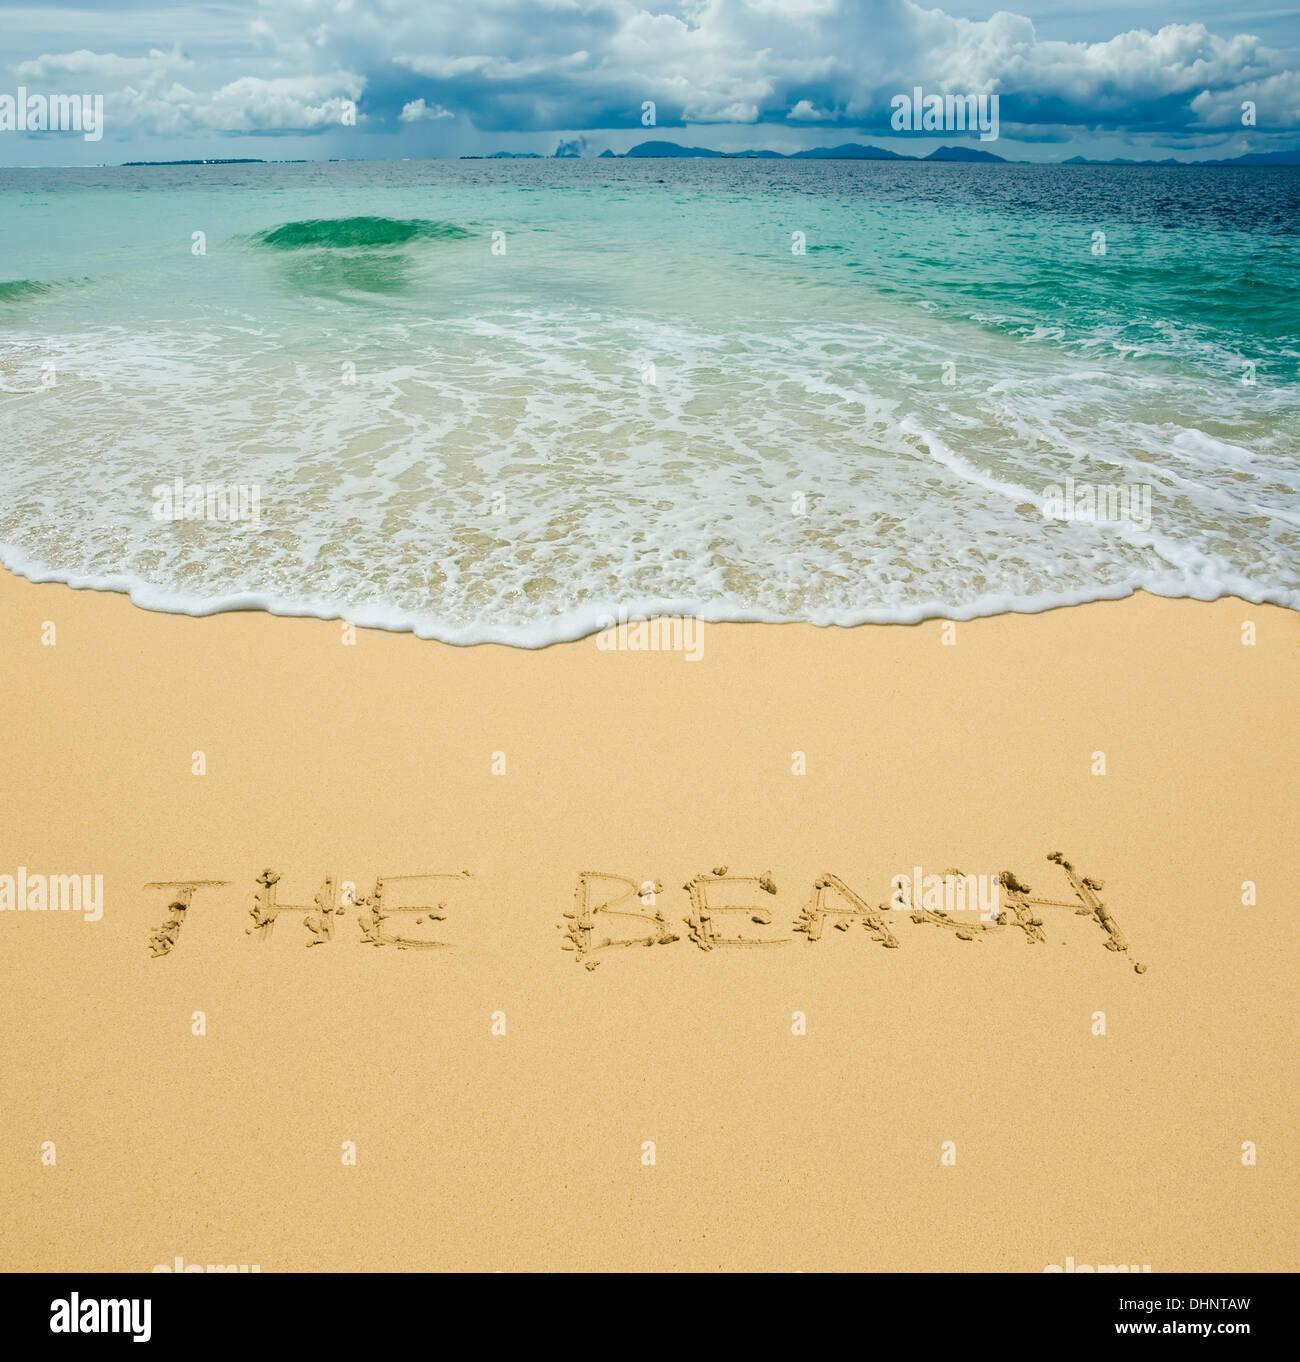 the beach written in a sandy tropical beach - Stock Image